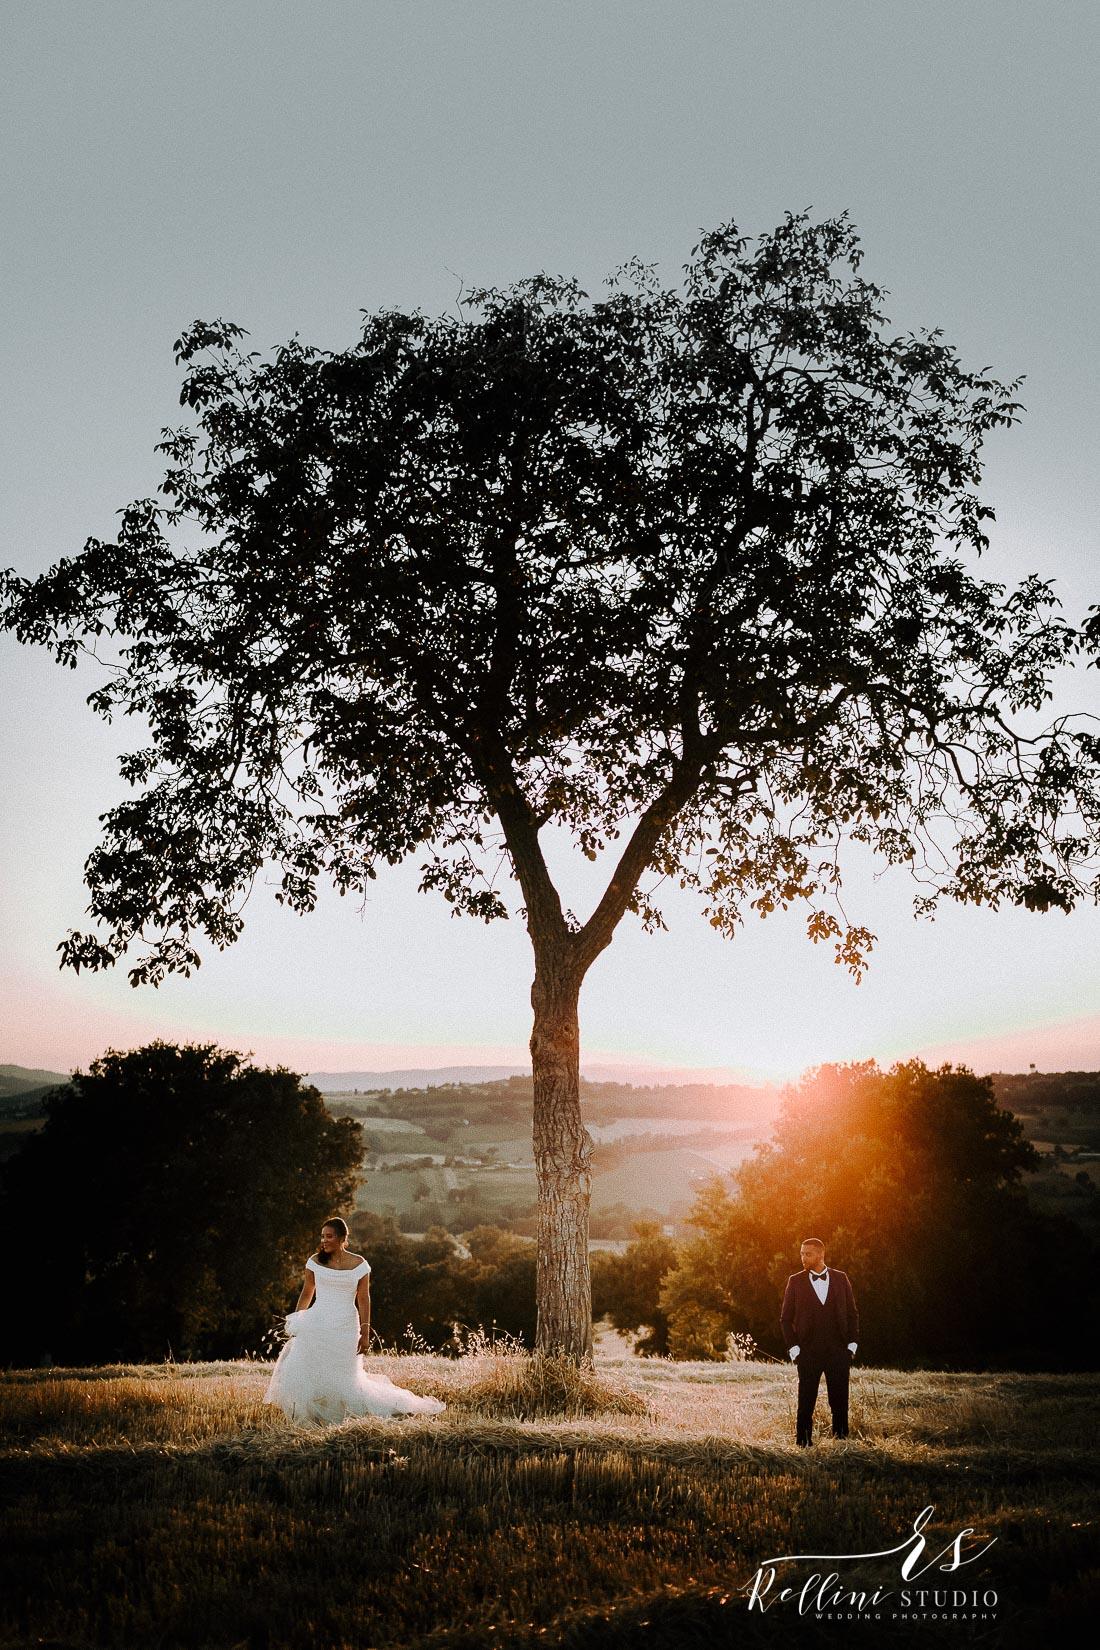 Wedding photographer Montignano Umbria Tuscany